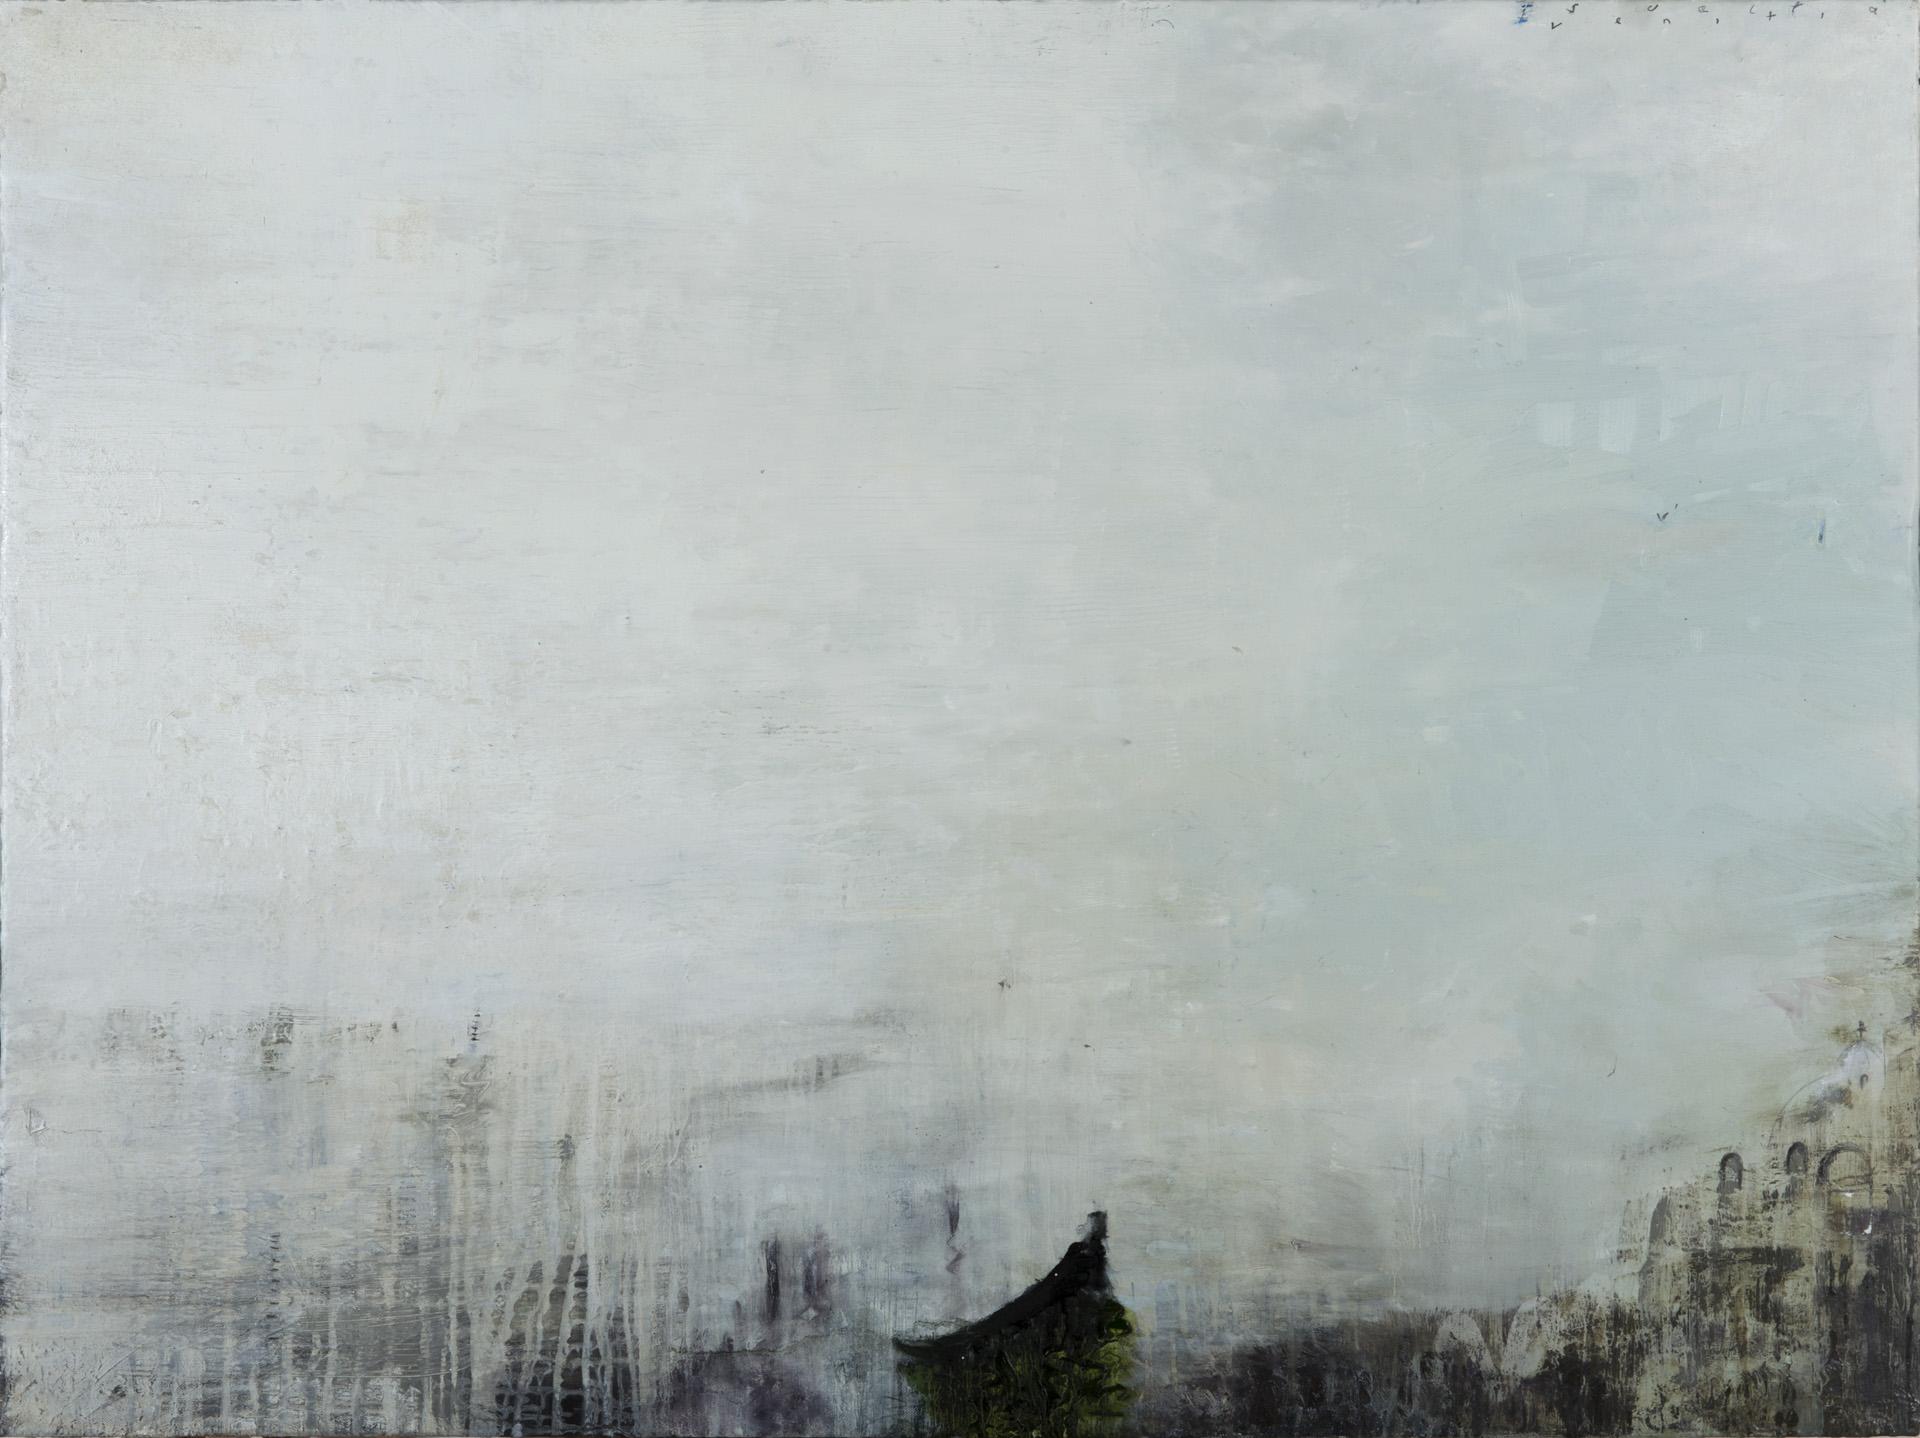 Gareth Edwards RWA Venezia 92 x 122 cm oil on canvas £5000